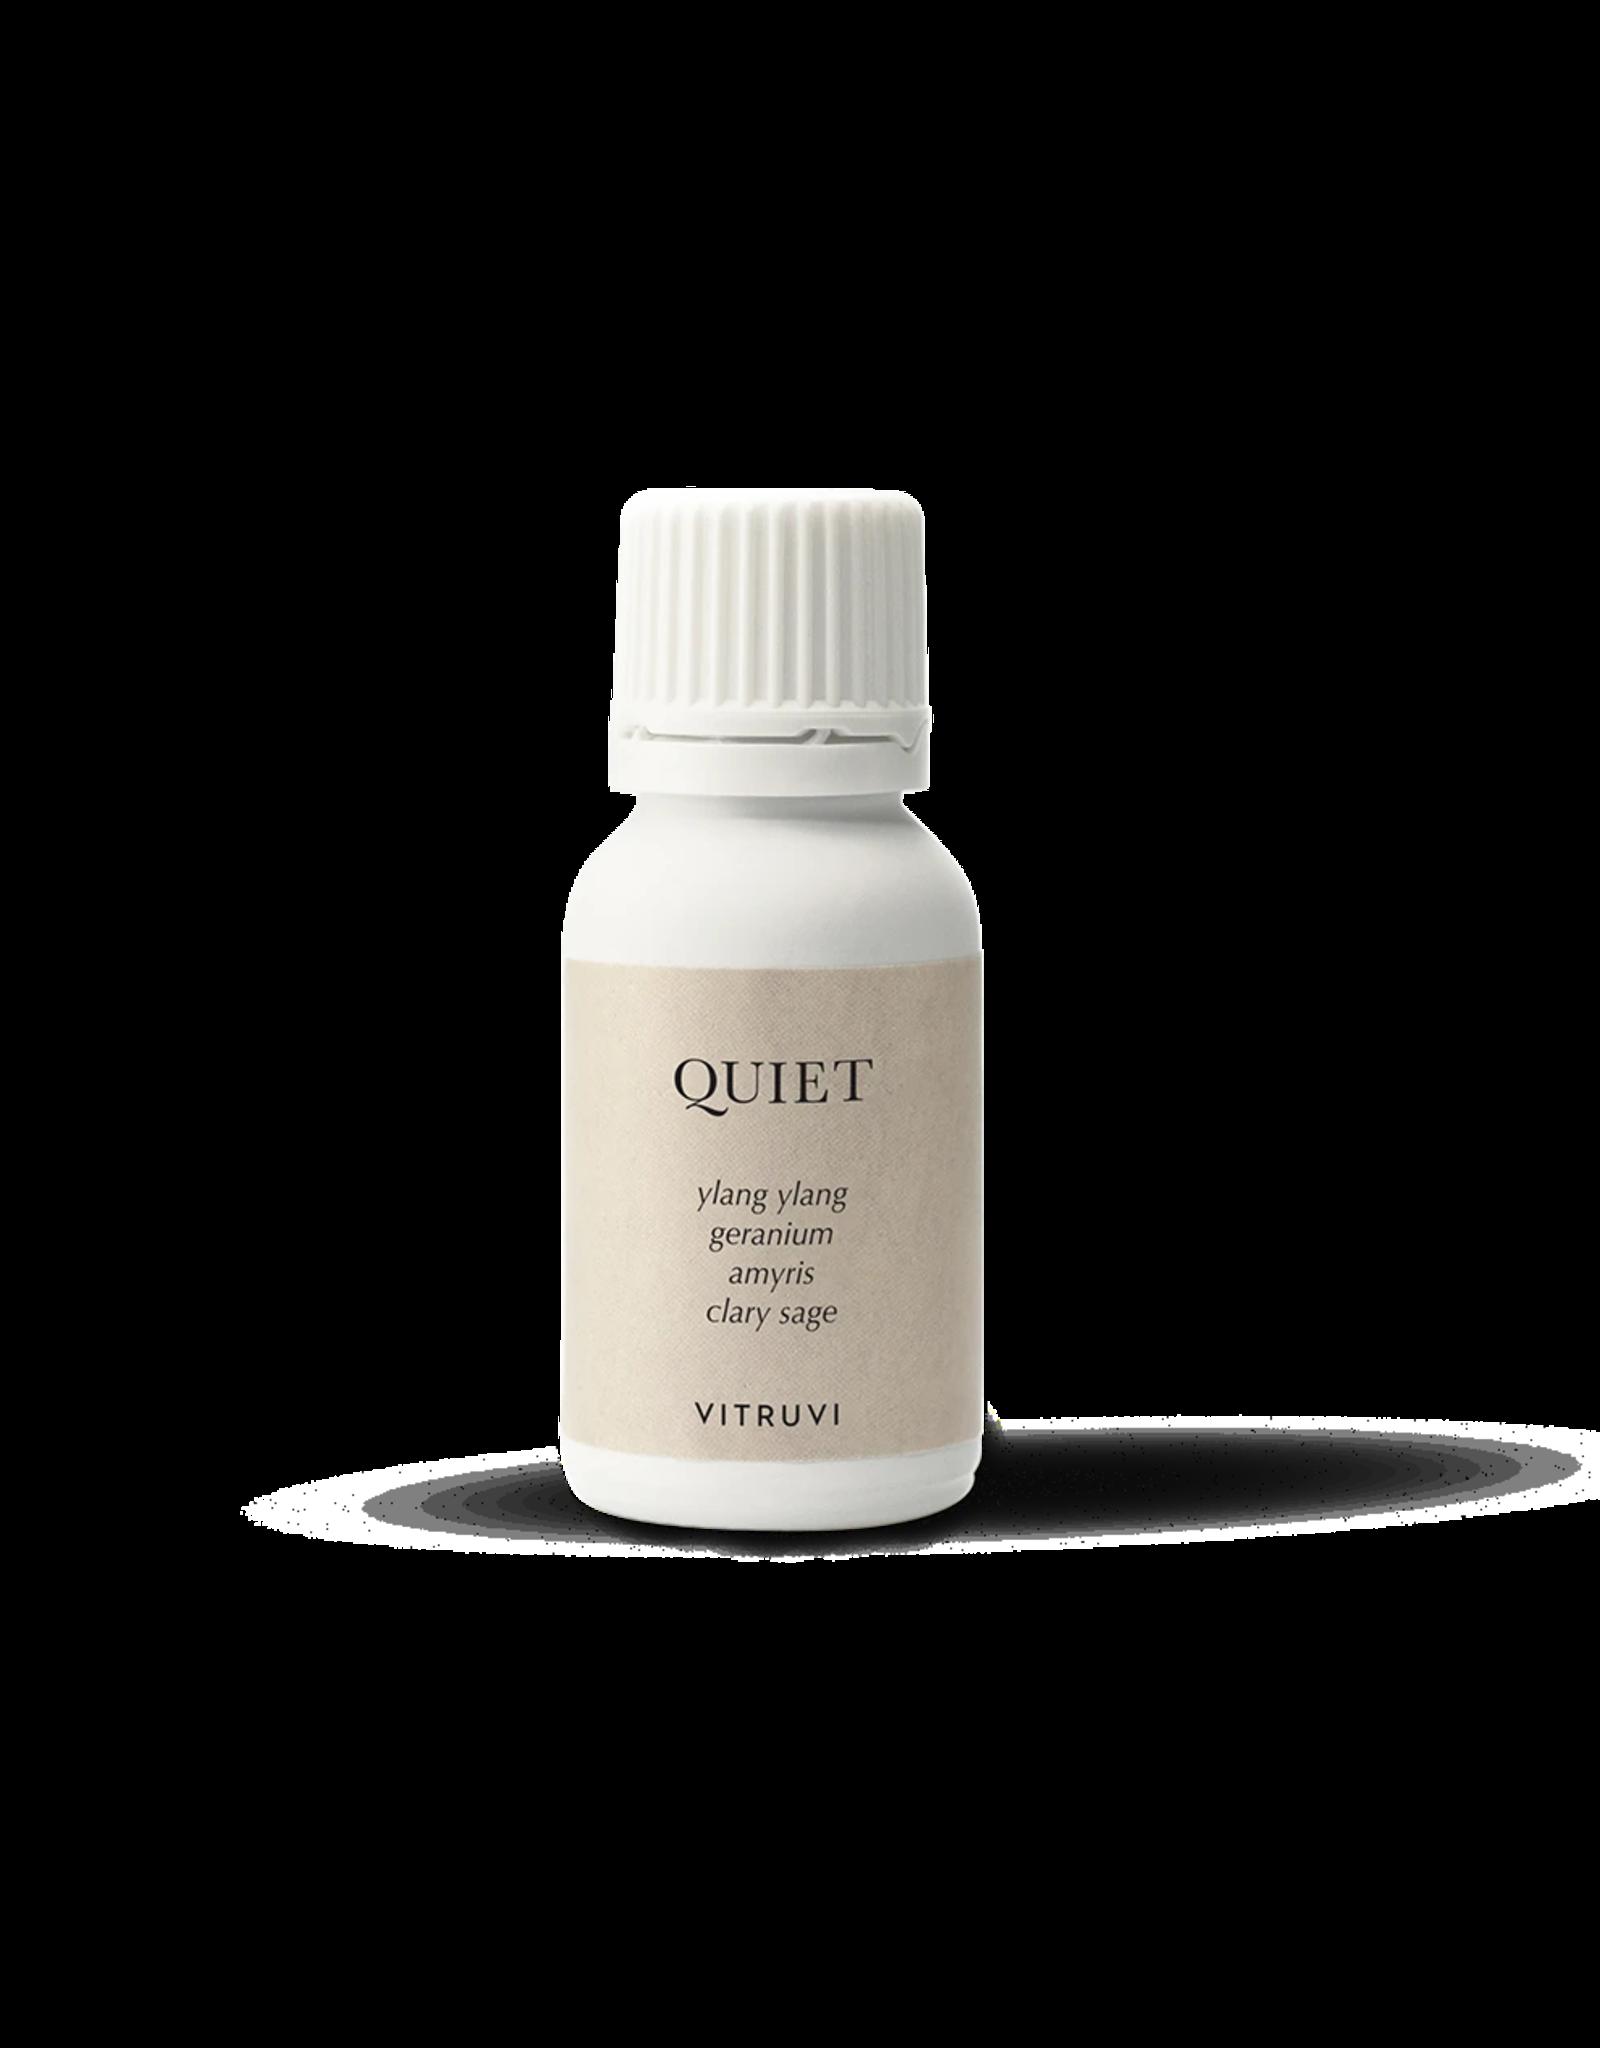 Vitruvi Diffuser Blend - Quiet